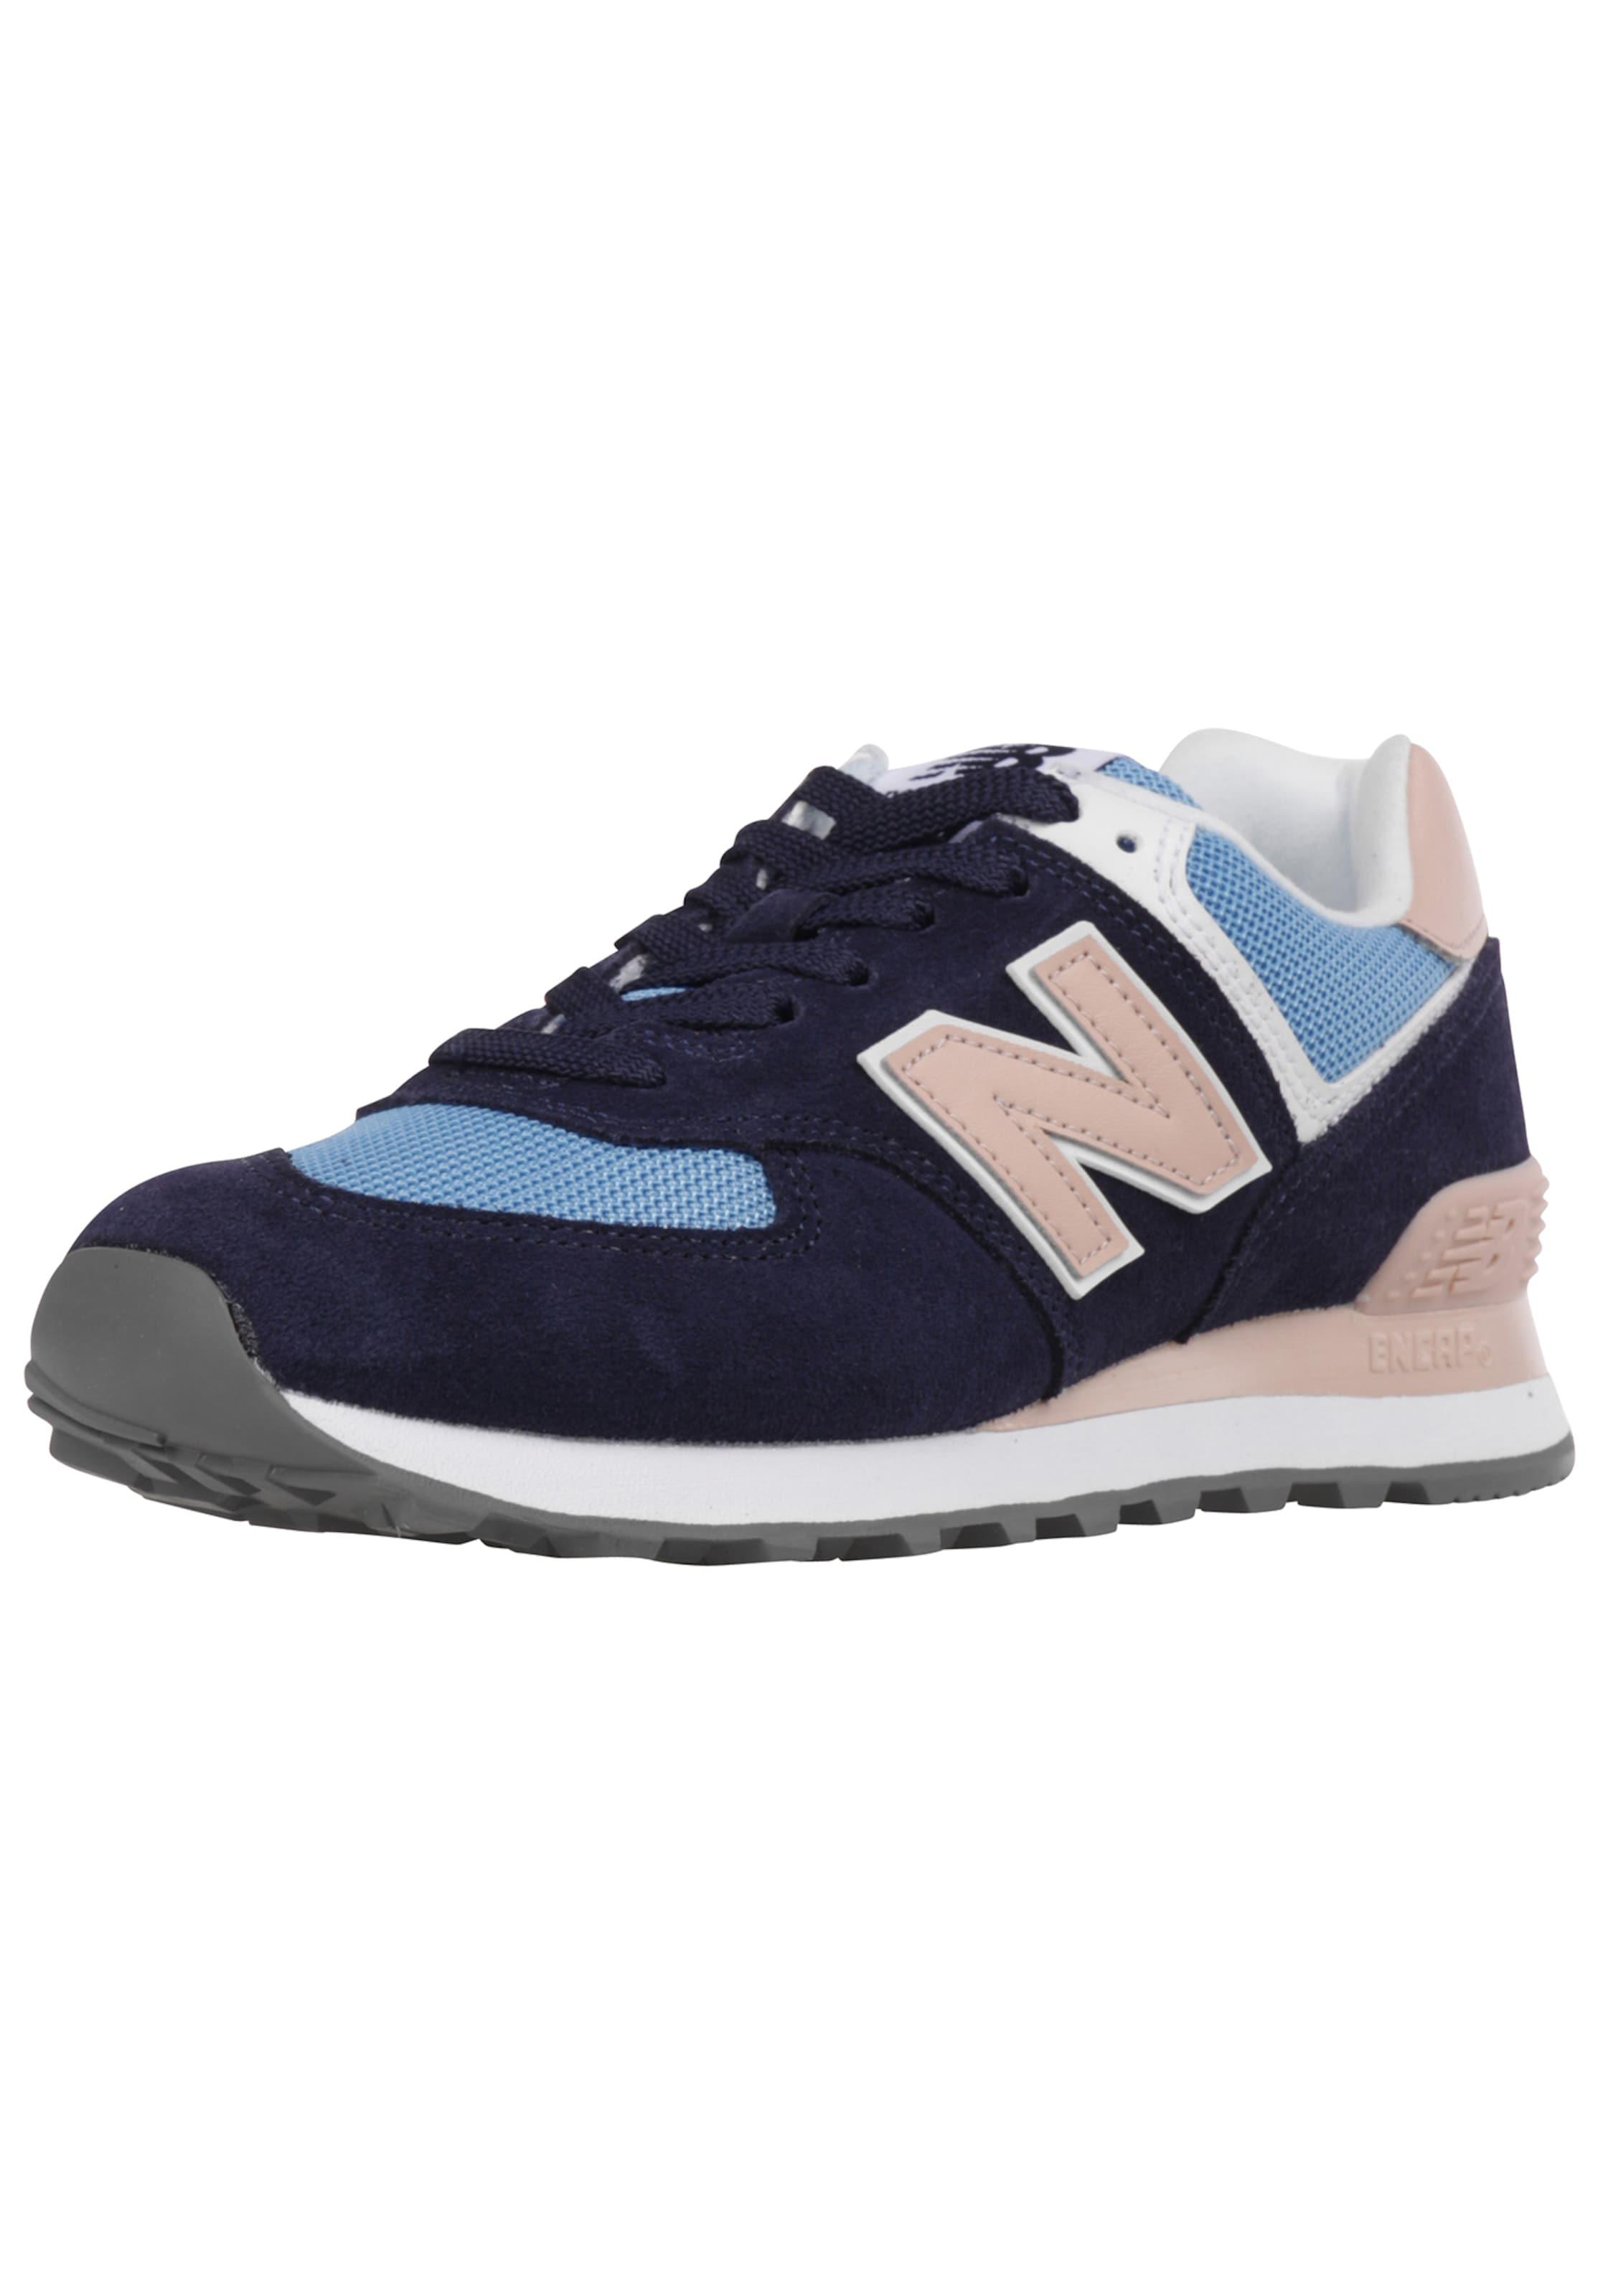 New In Wl574 Sneaker NavyHellblau Rosa Balance 6gby7f